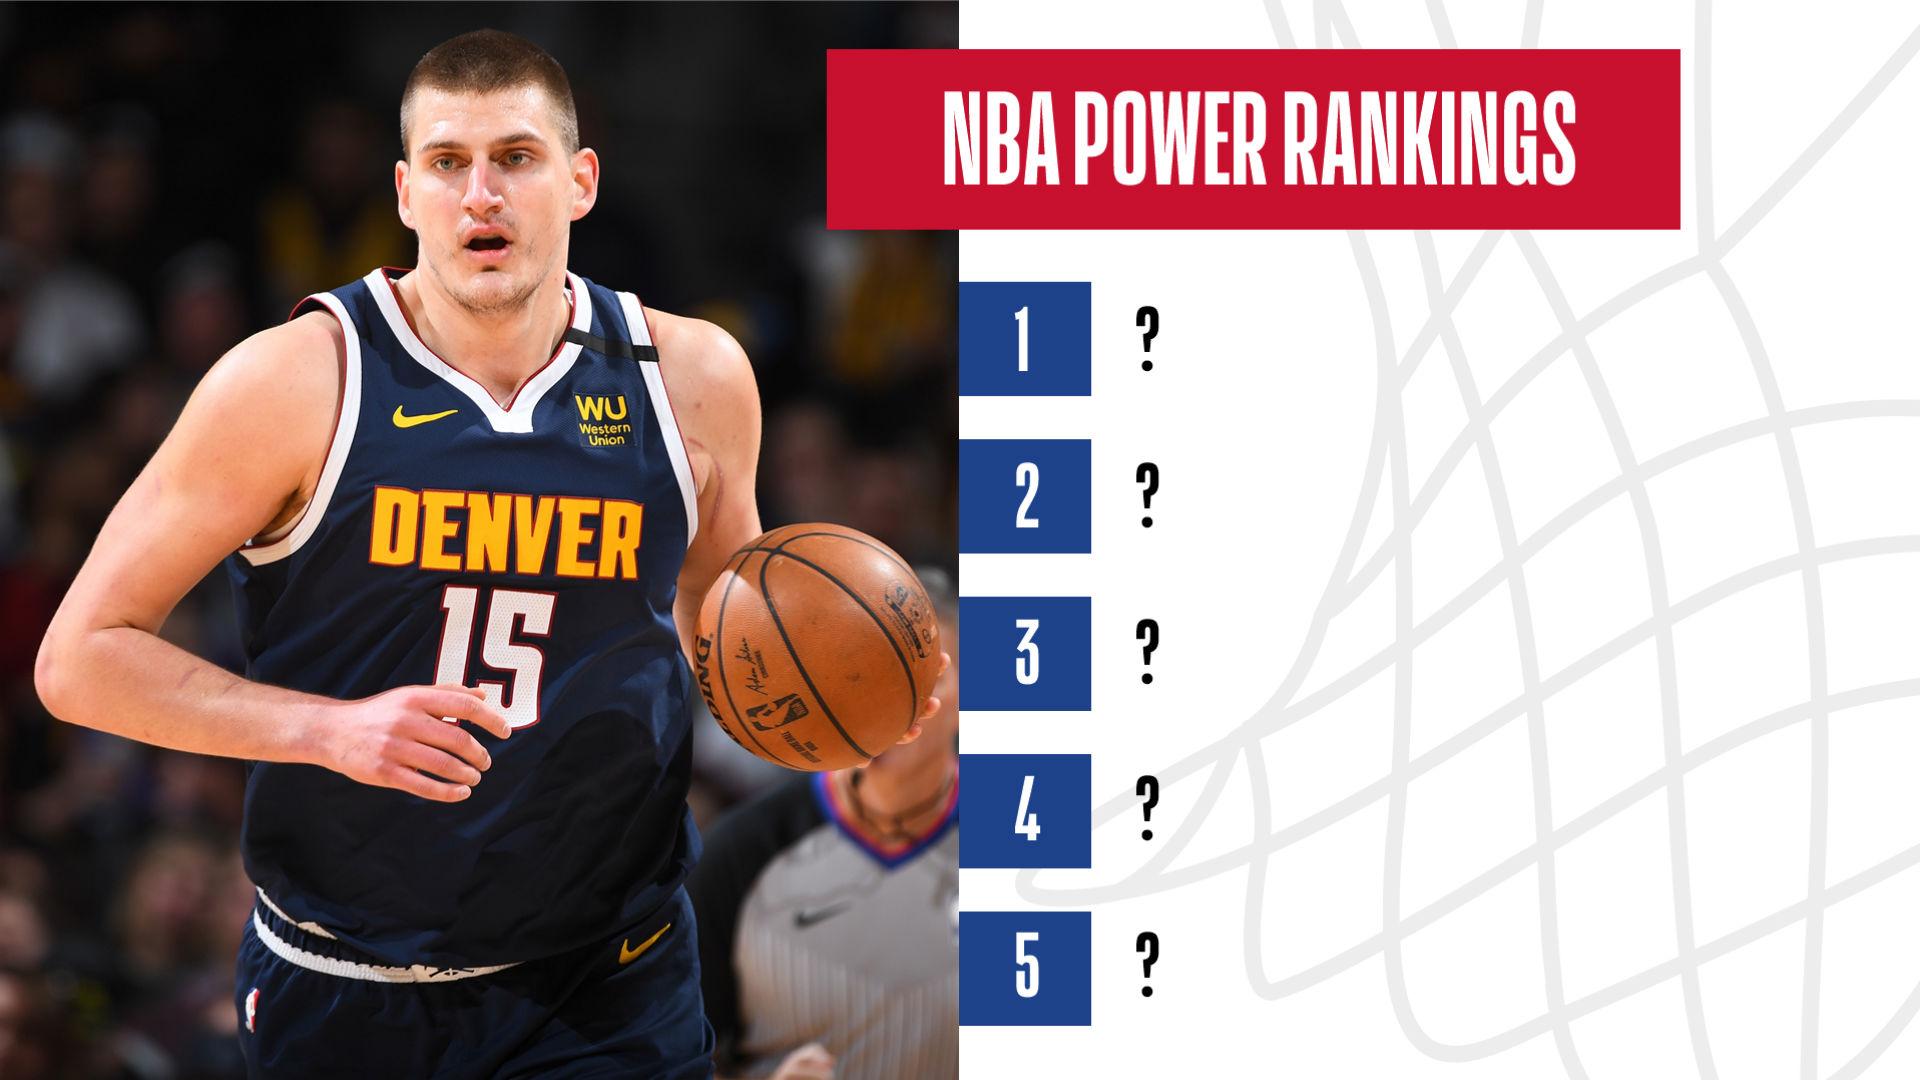 Nba Power Rankings Toronto Raptors Denver Nuggets